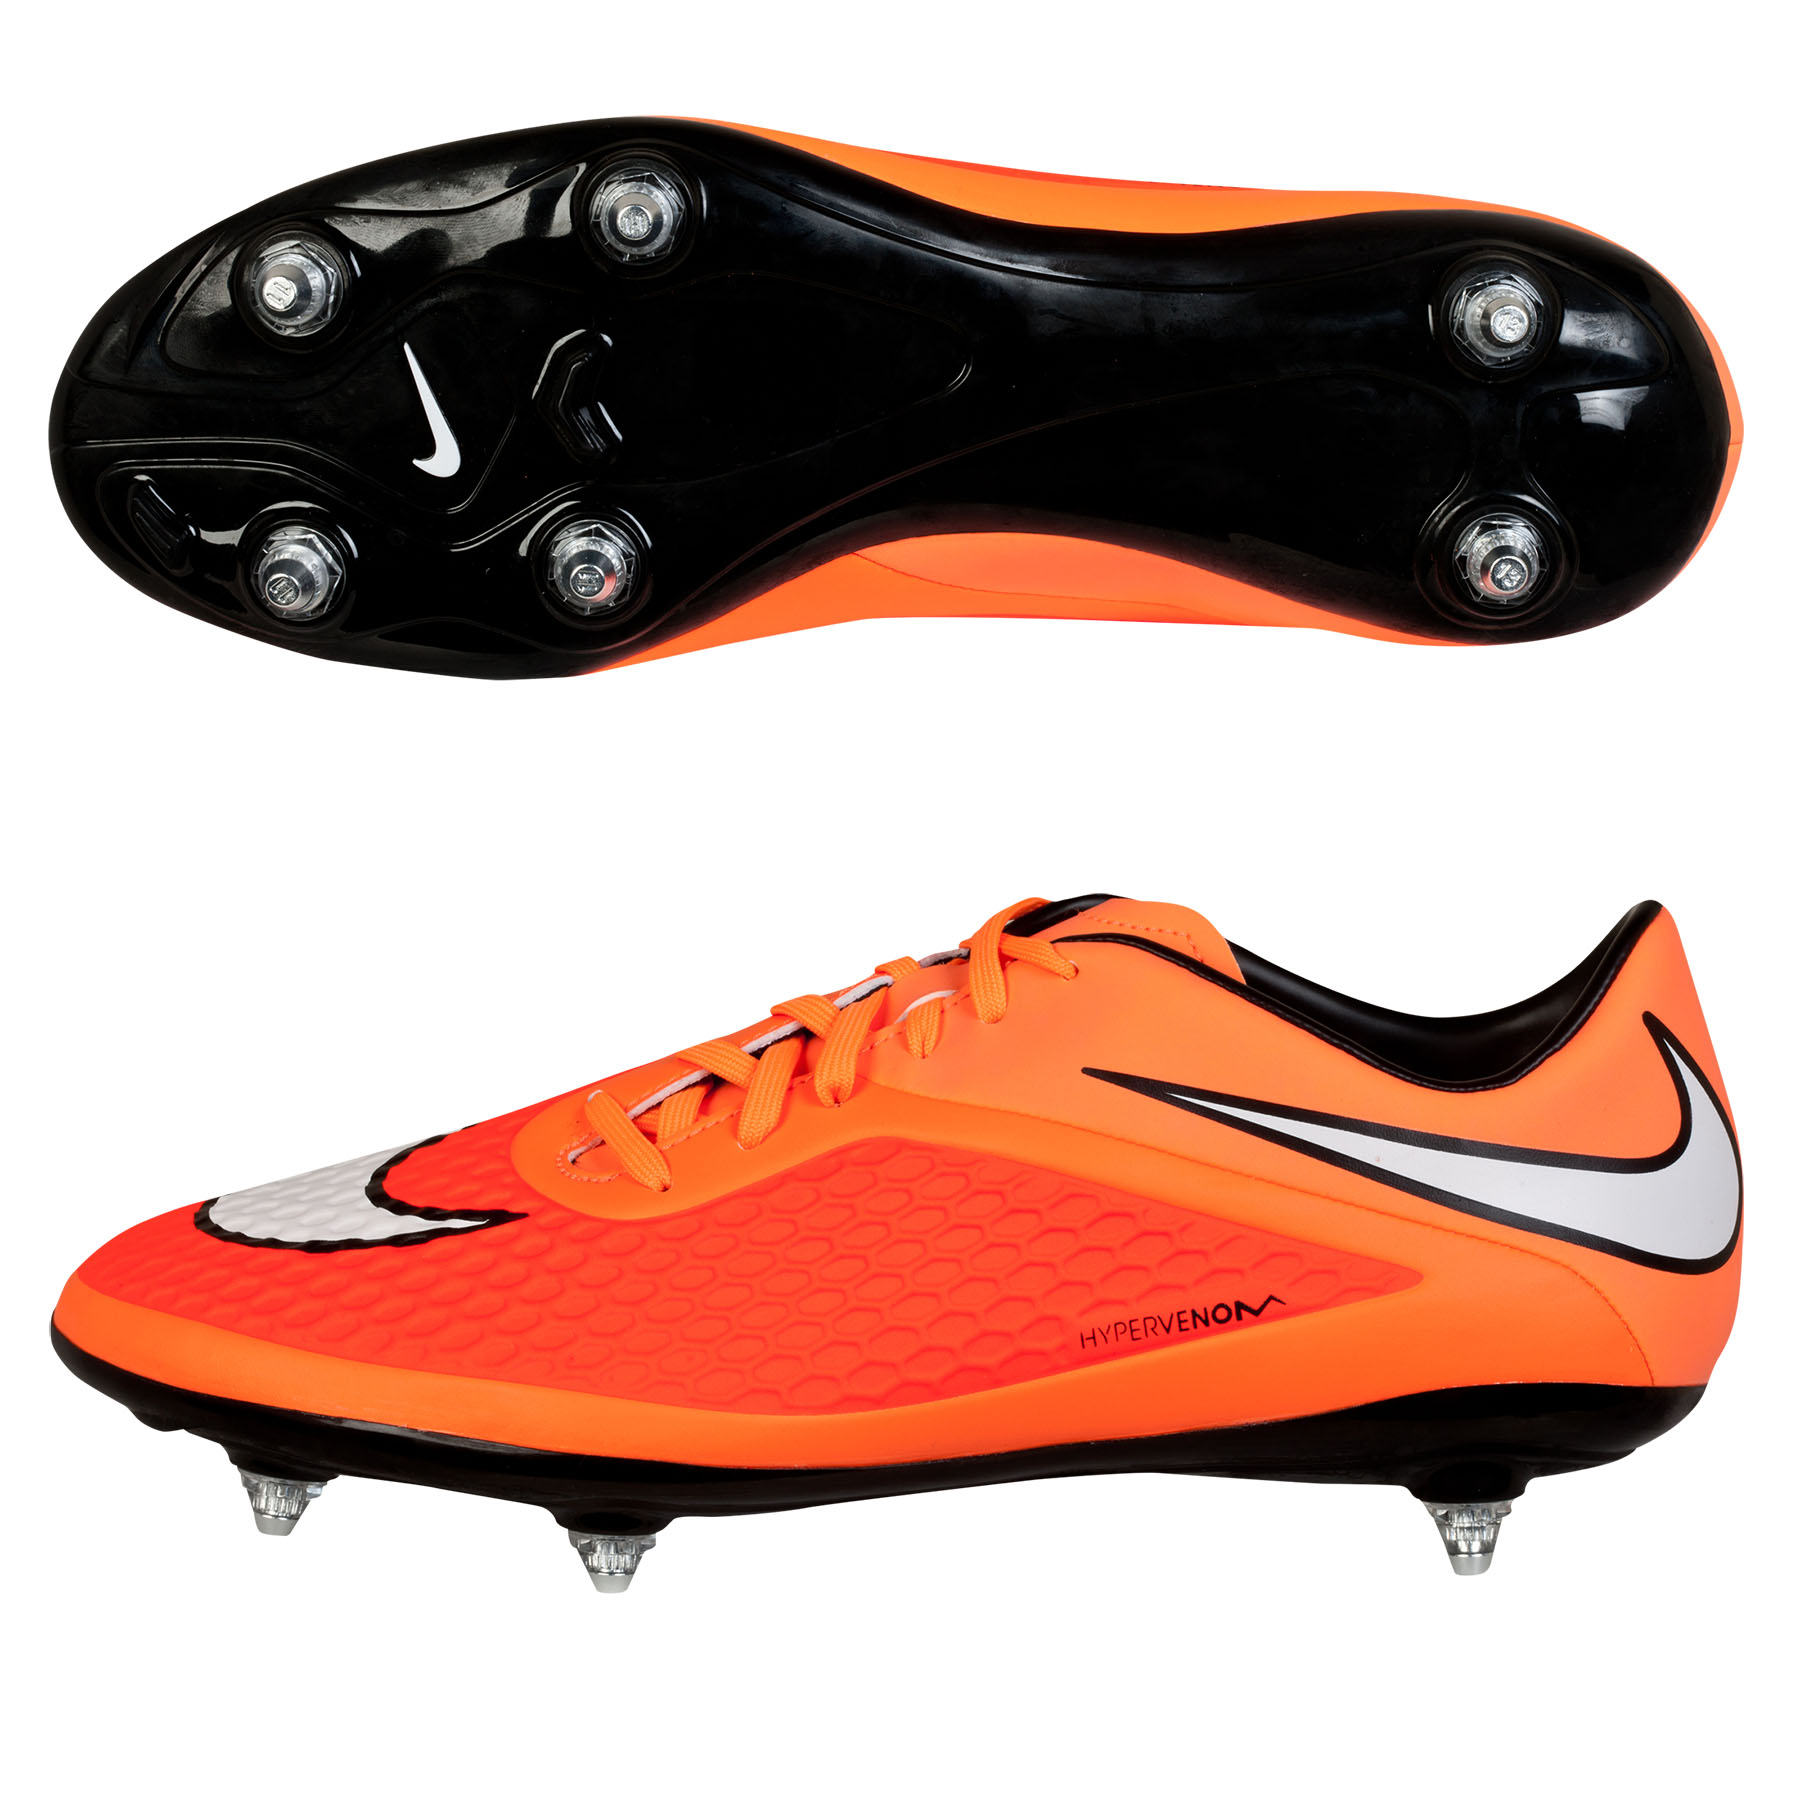 Nike Hypervenom Phelon Soft Ground Football Boots Orange